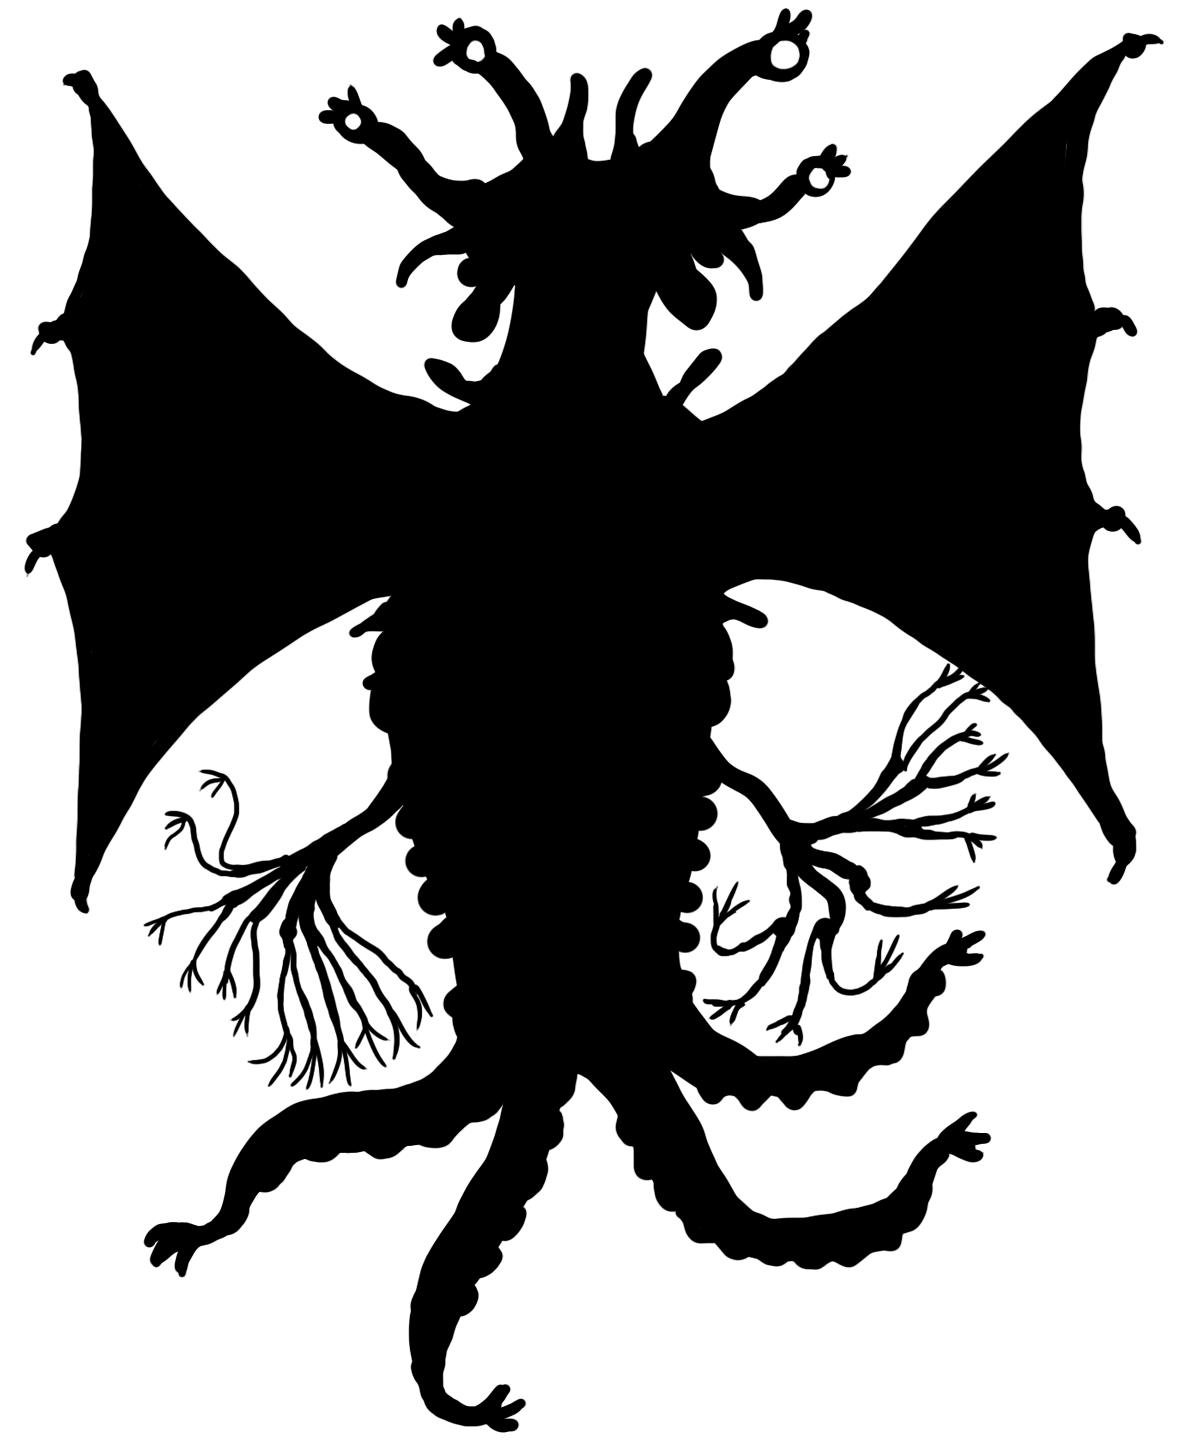 Elder Thing Silhouette - Miskatonic Repository Image